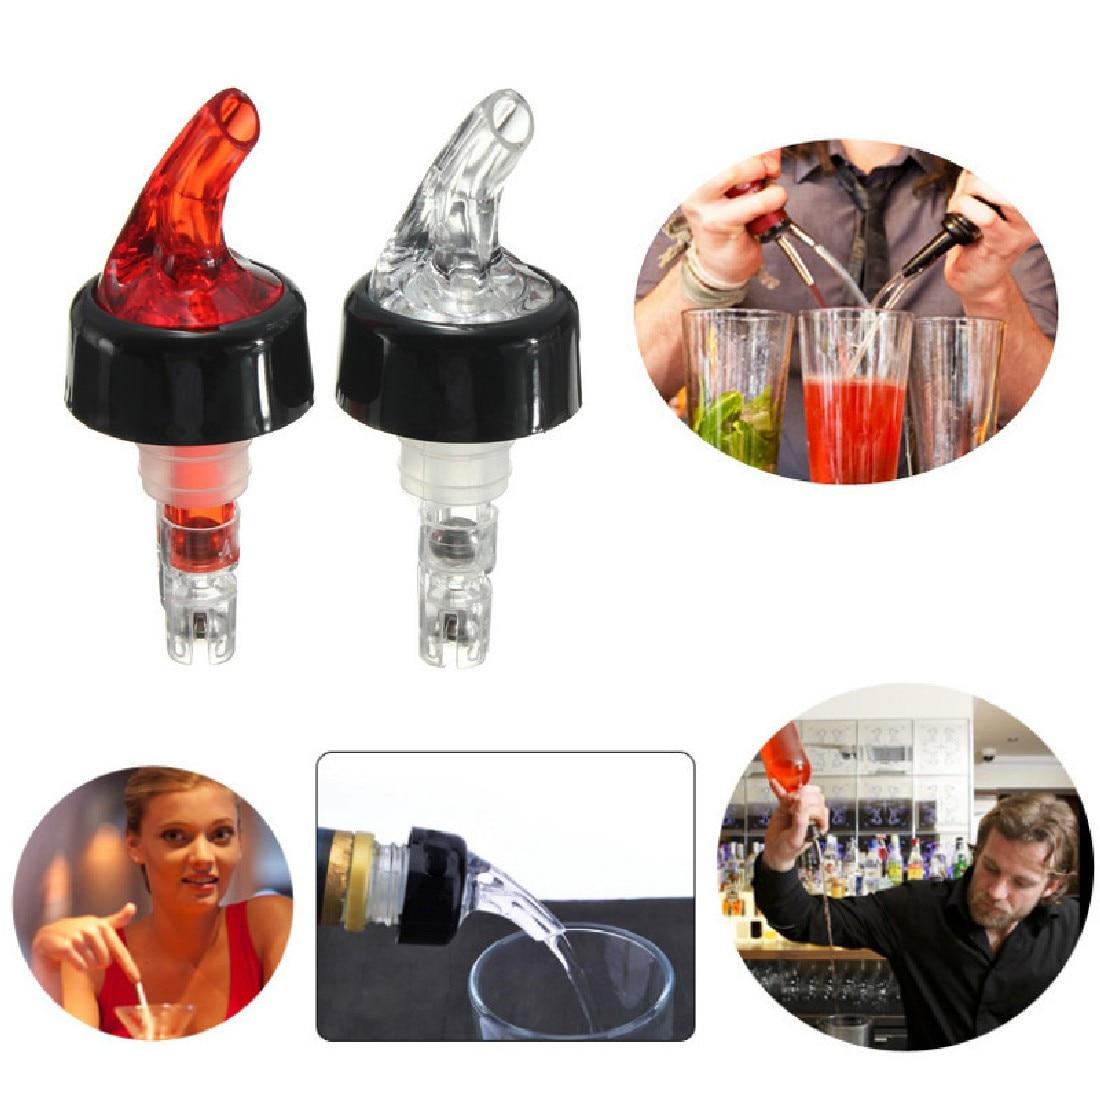 New Wholesale Fashion 30mL Quick Shot Spirit Measure Measuring Pourer Drinks Wine Cocktail Dispenser Home  Bar Tools